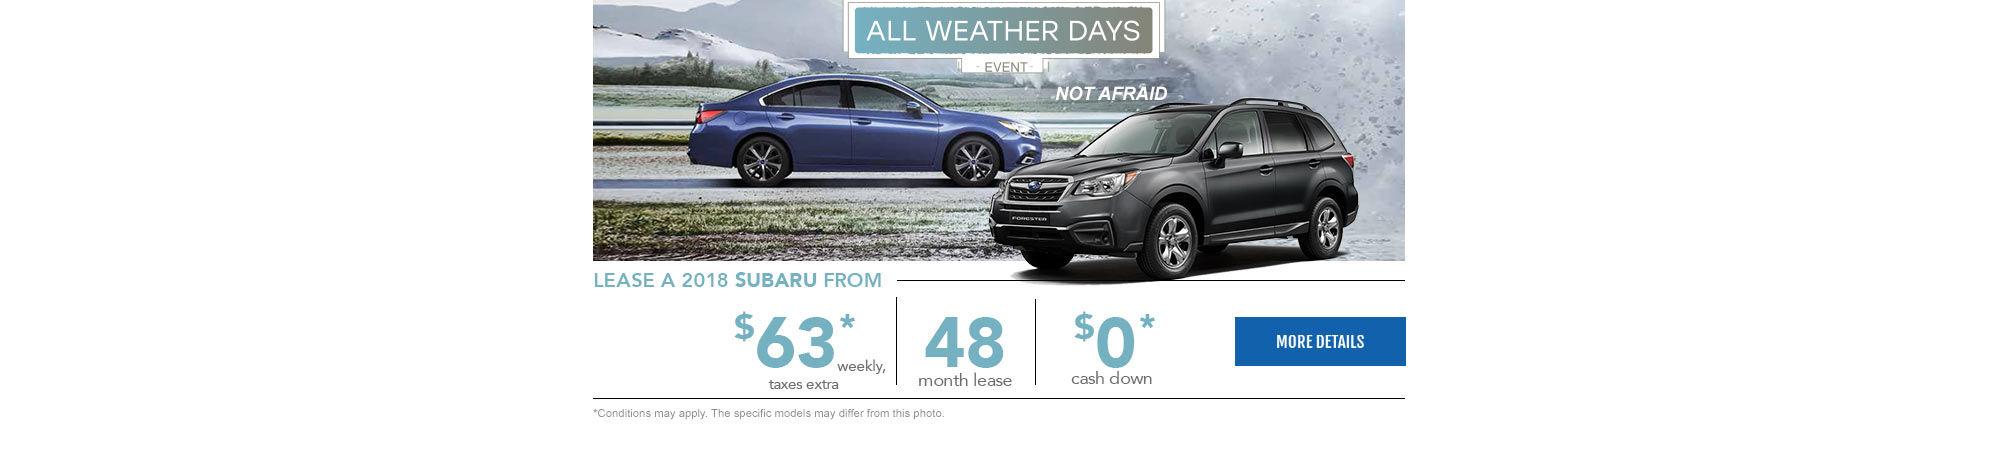 All weather days - Subaru